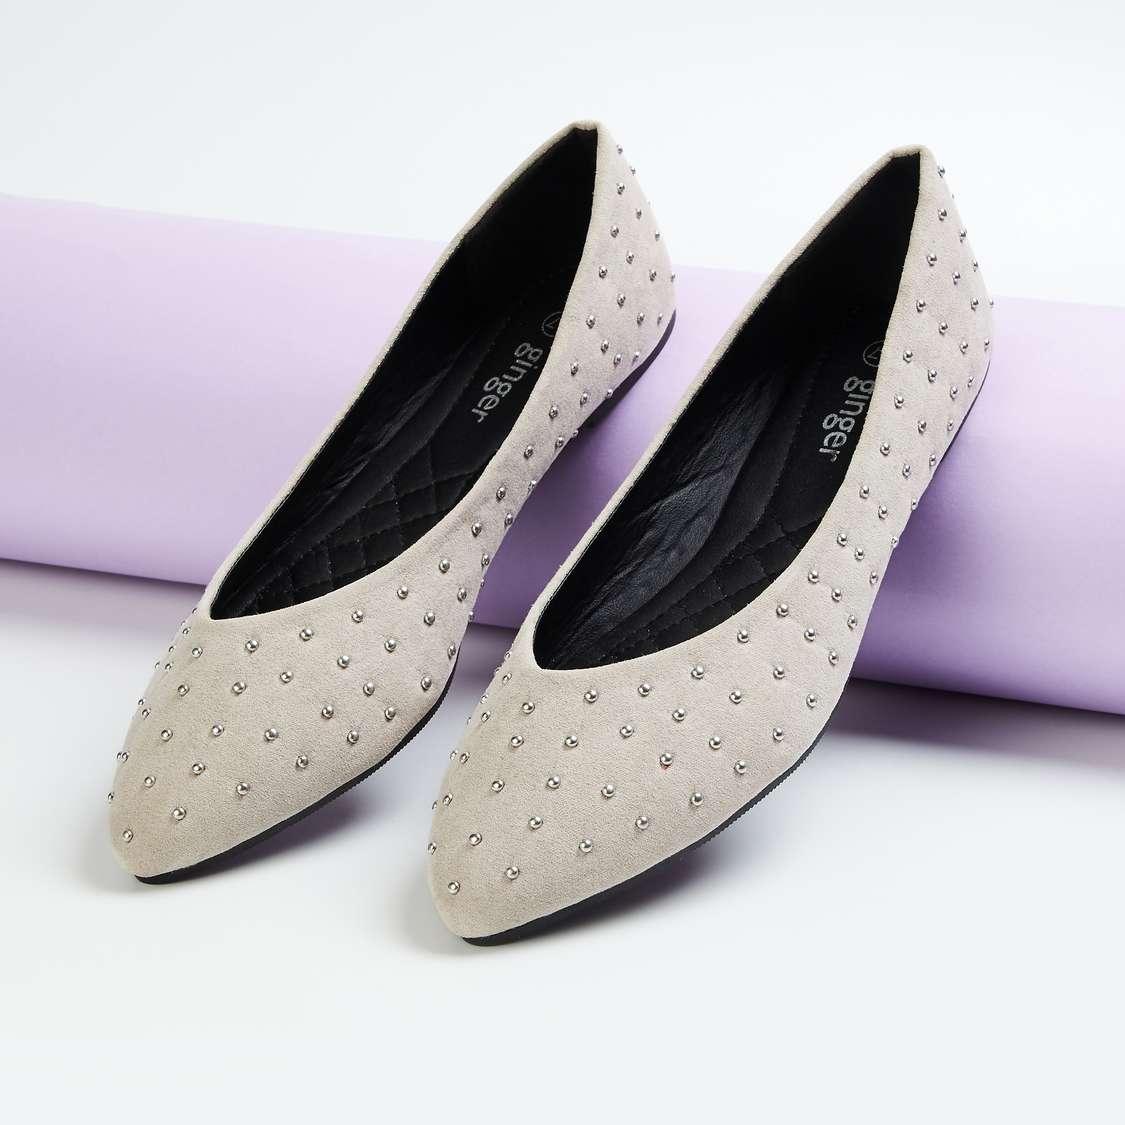 GINGER Women Embellished Pointed Toe Ballerinas